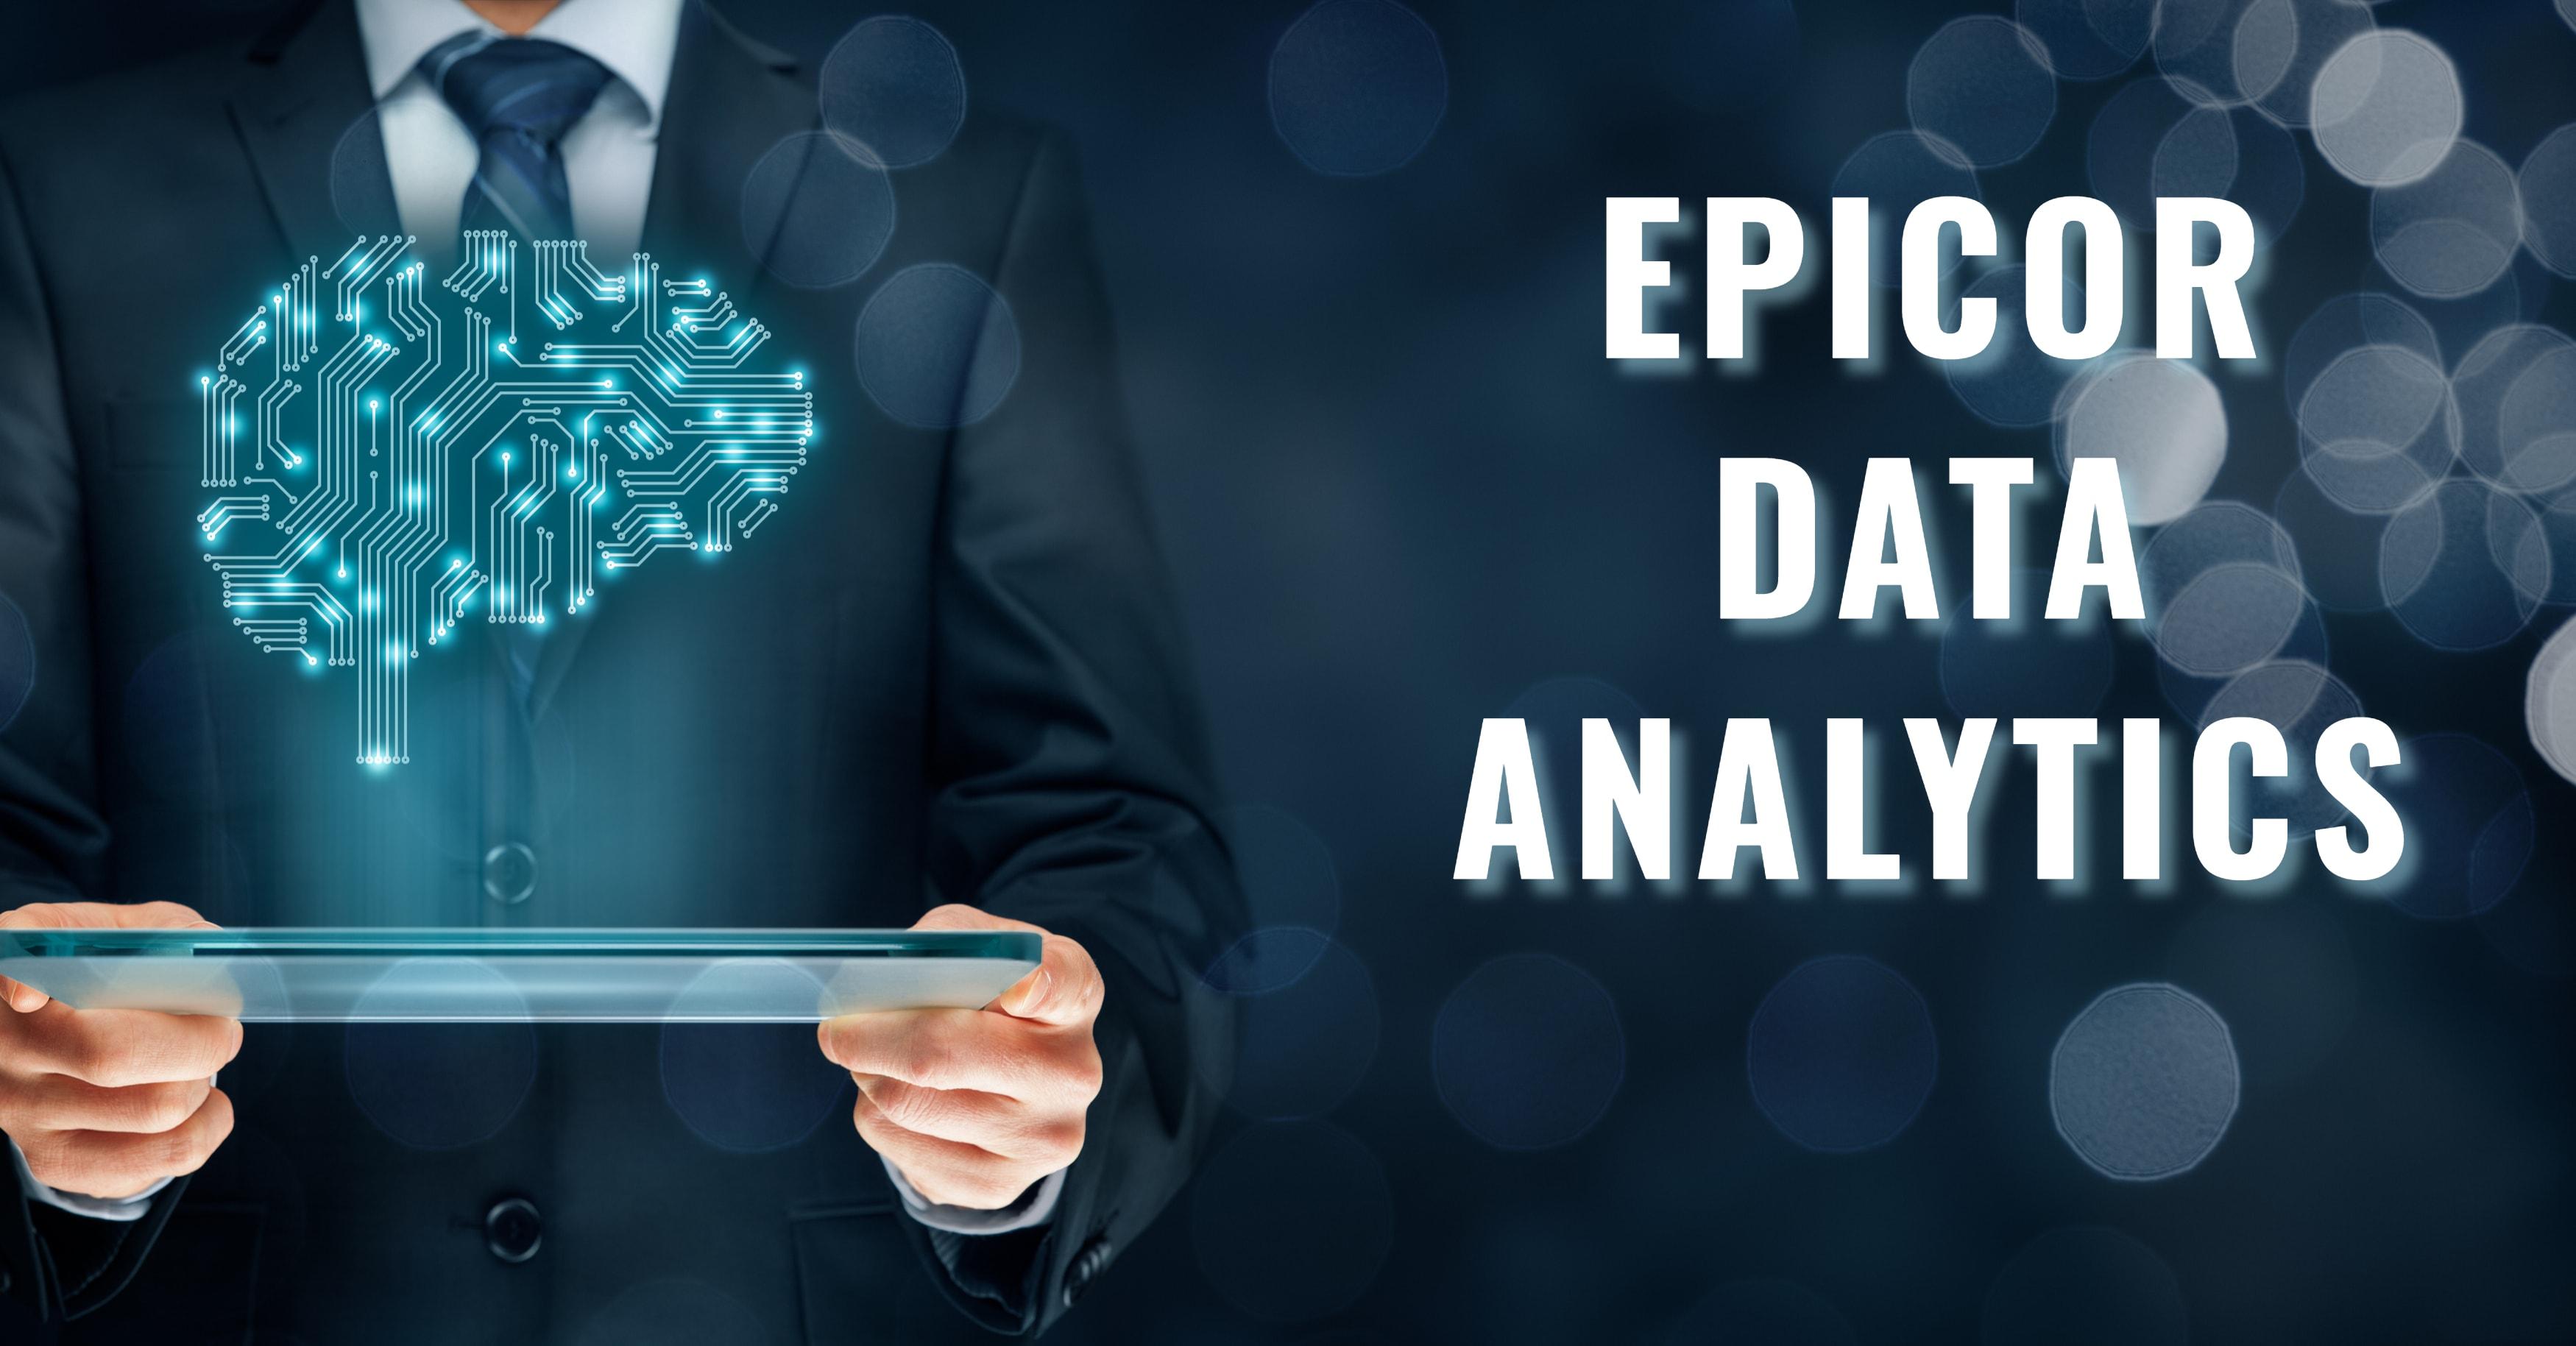 Epicor Data Analytics Earns Top Rankings in New BI Survey